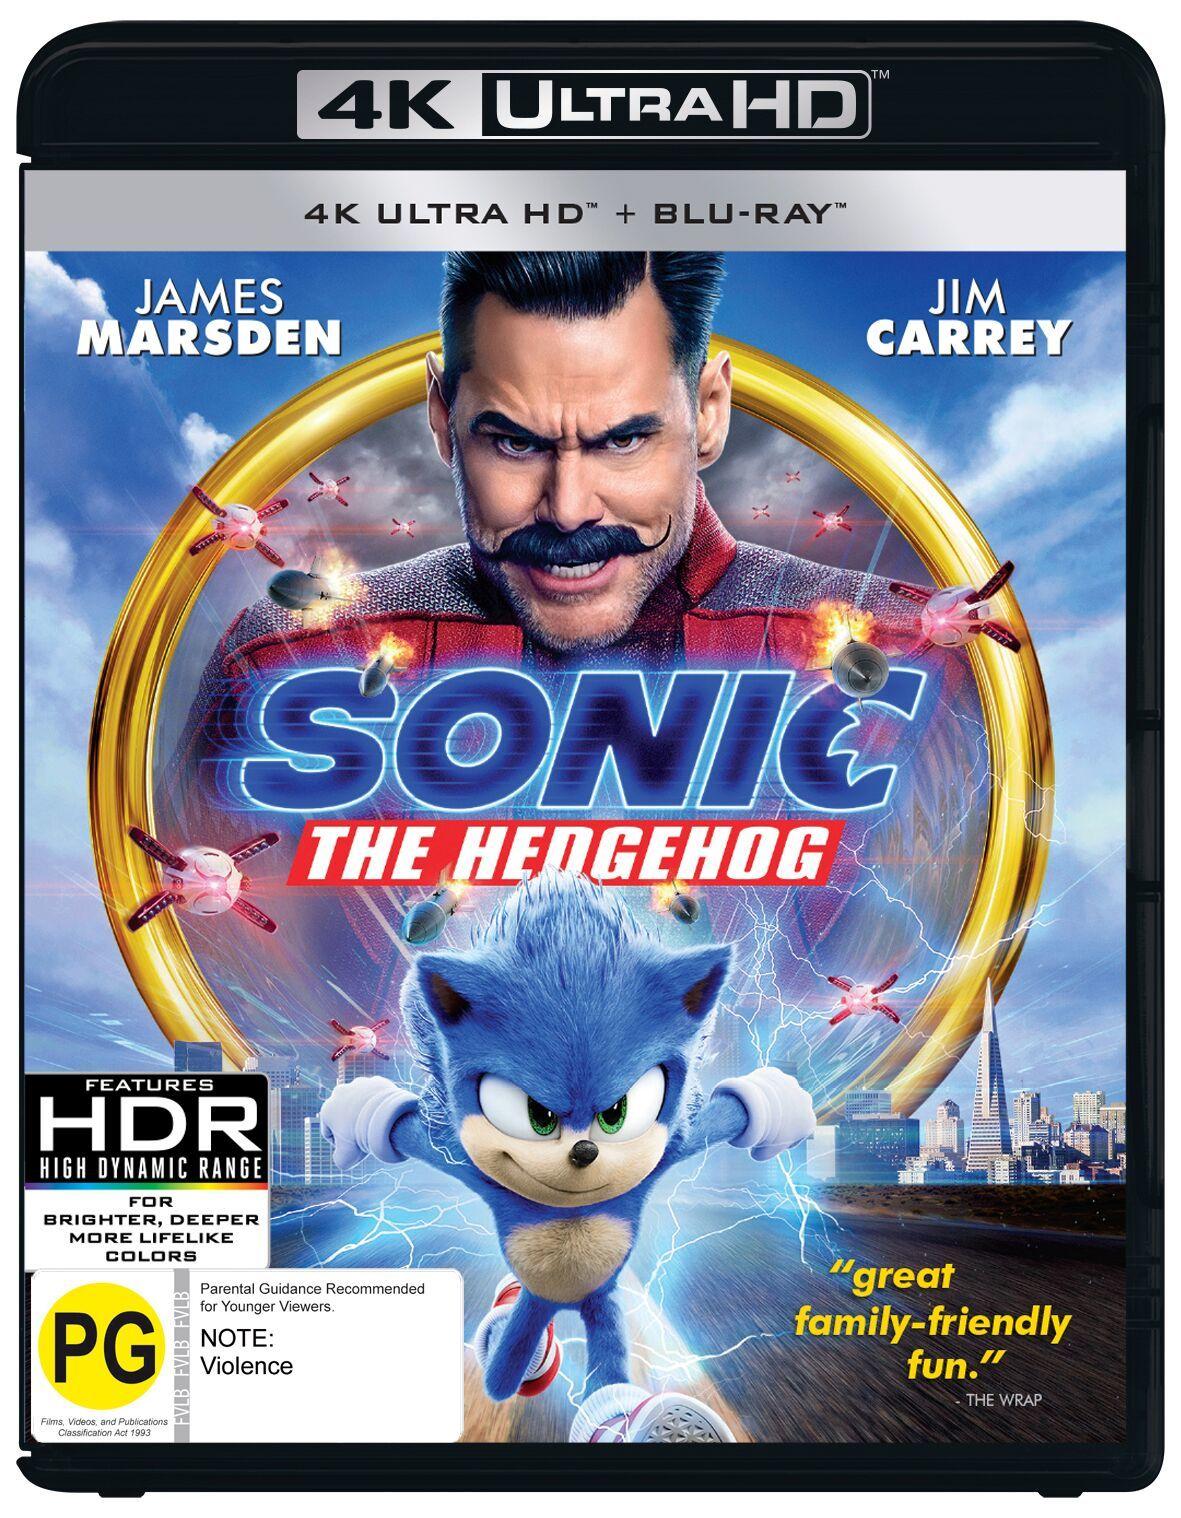 Sonic The Hedgehog on UHD Blu-ray image